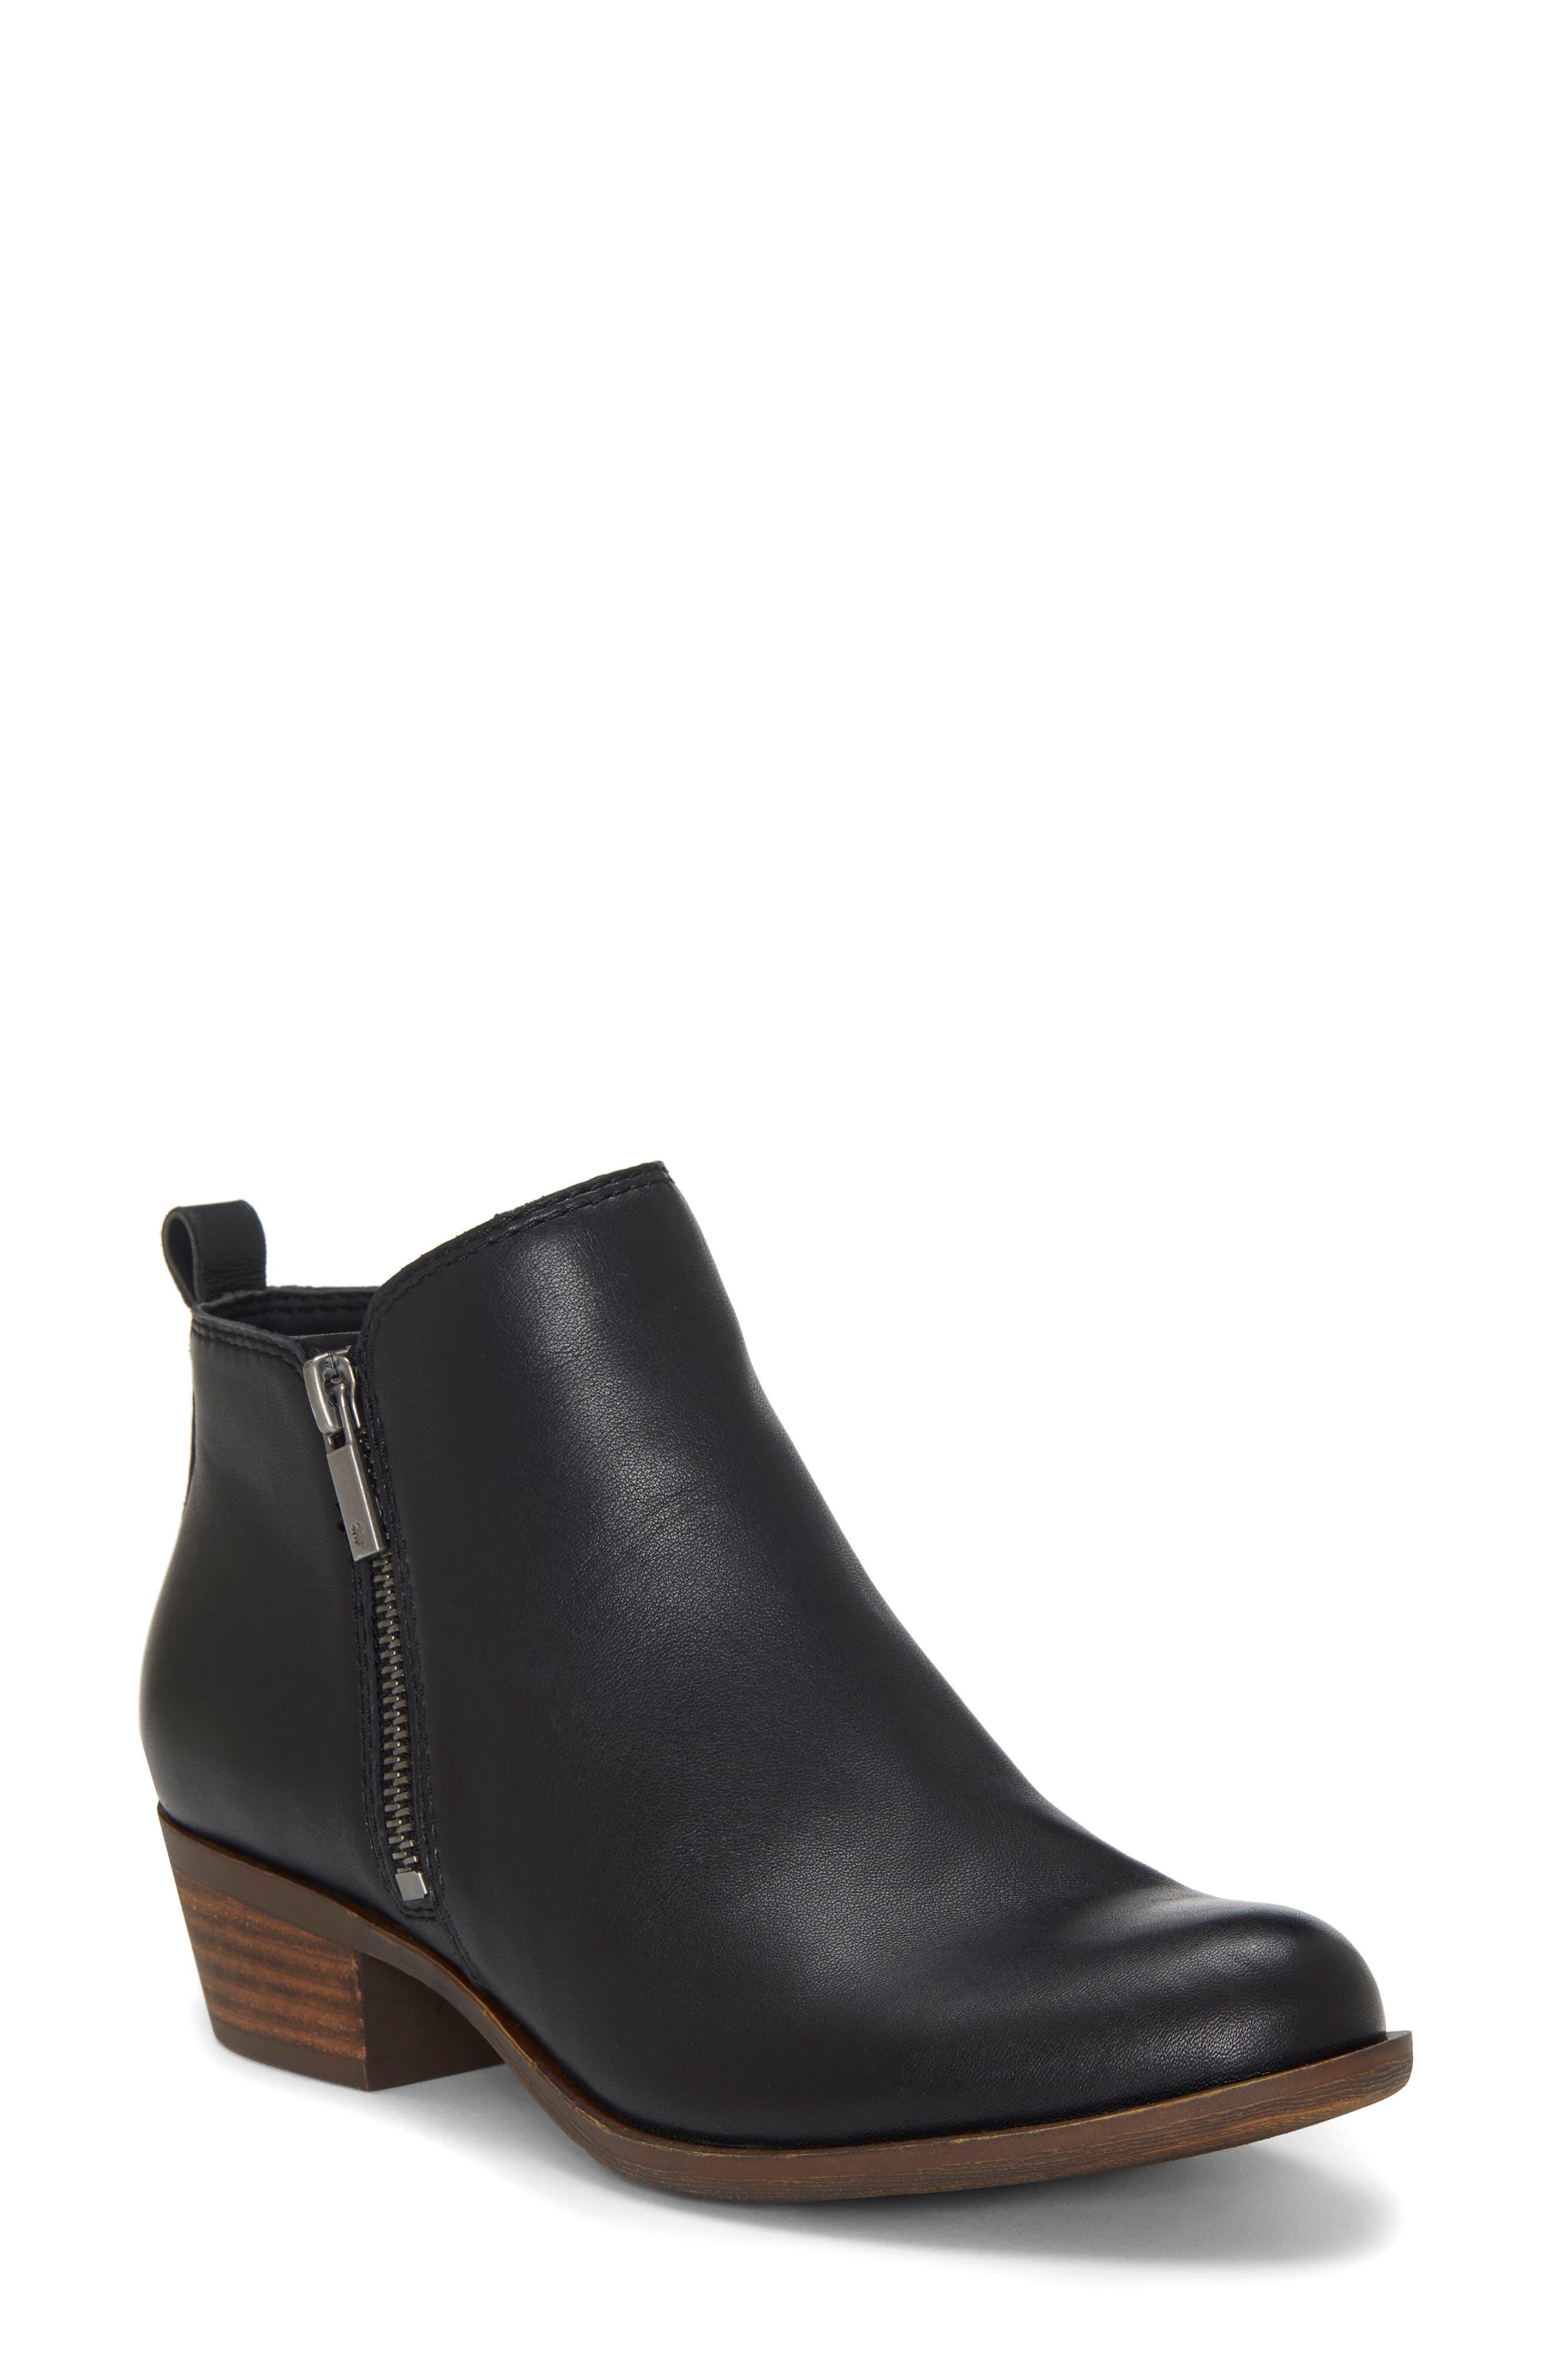 LUCKY BRAND Women'S Basel Booties Women'S Shoes in Black